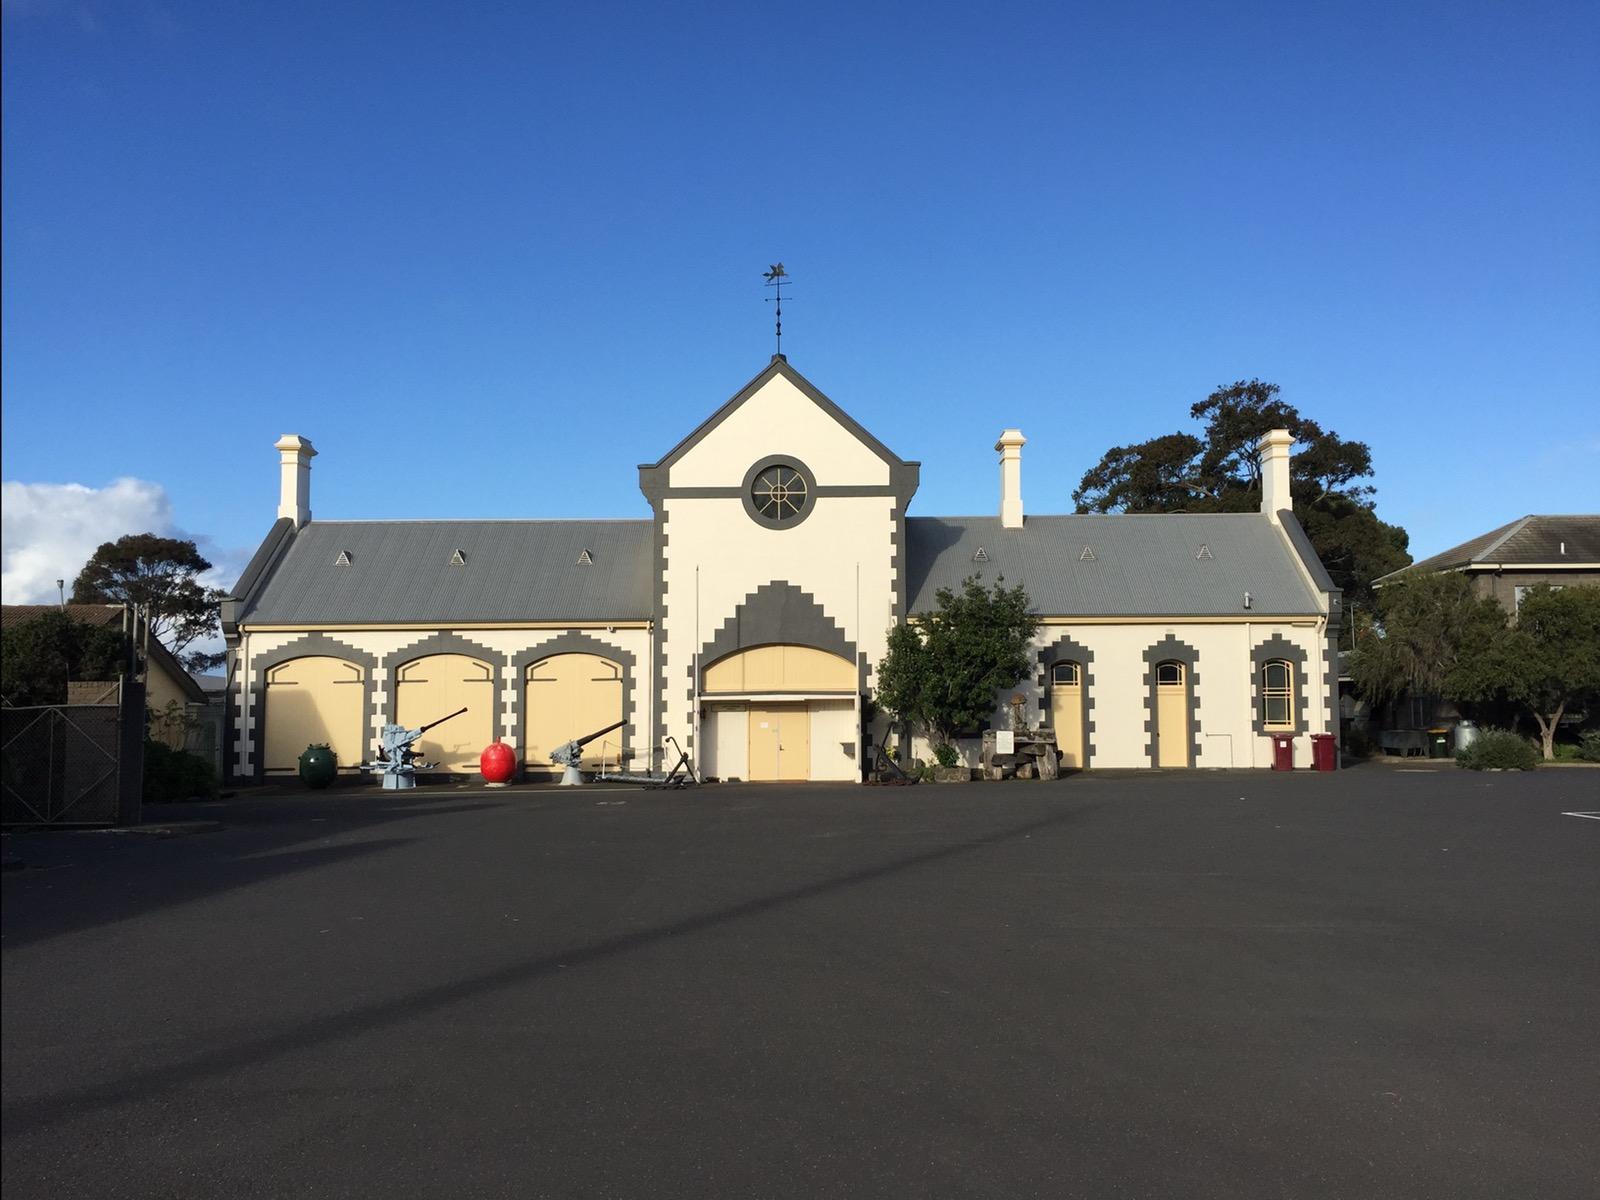 Geelong Maritime Museum building